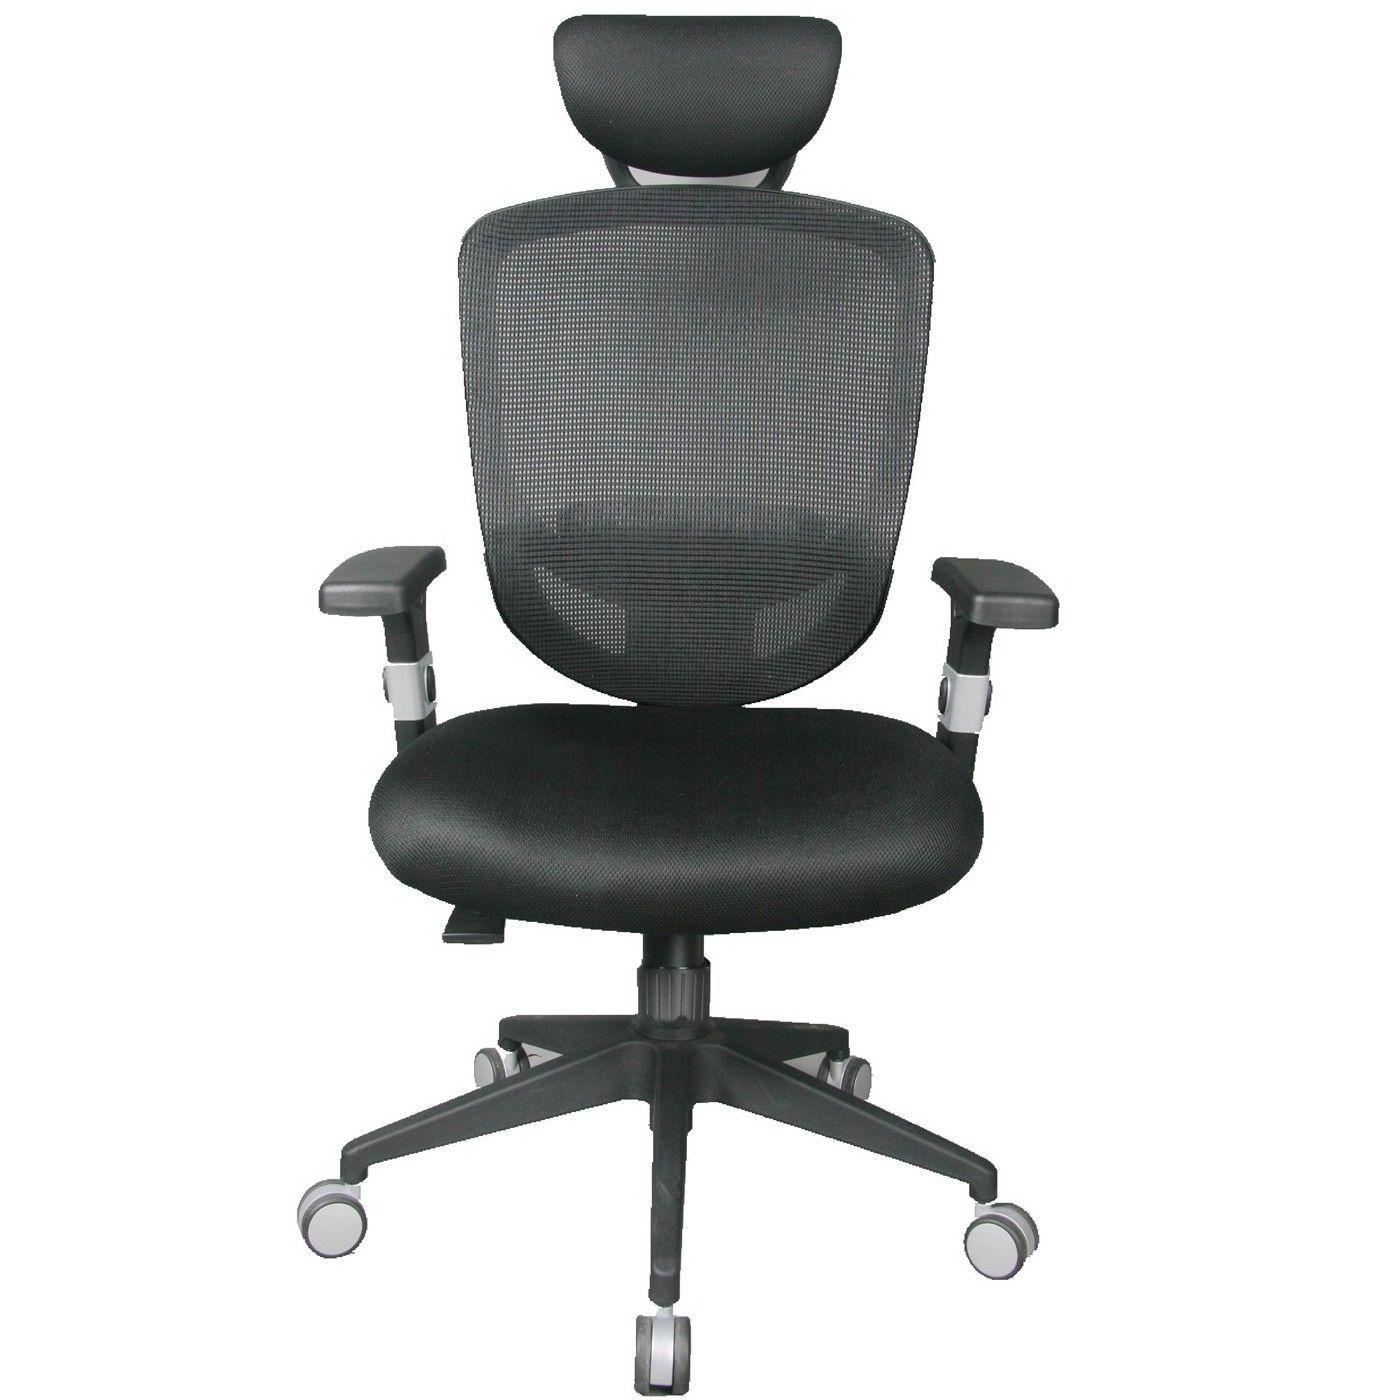 TygerClaw High Back Mesh fice Chair with Headrest